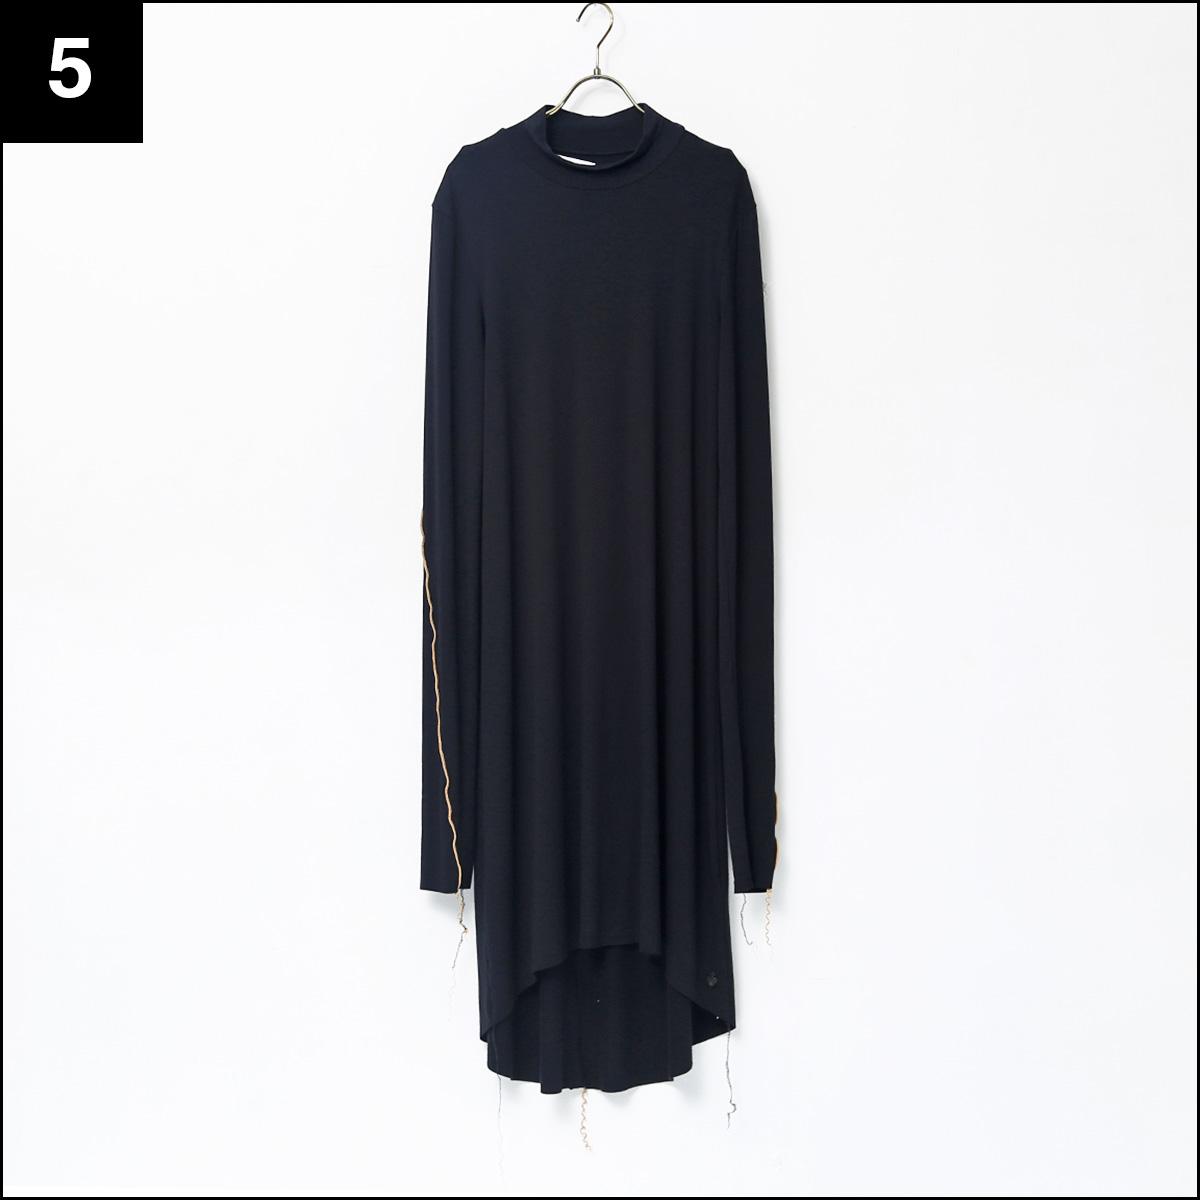 NOSTRASANTISSIMA_STITCHED DRESS